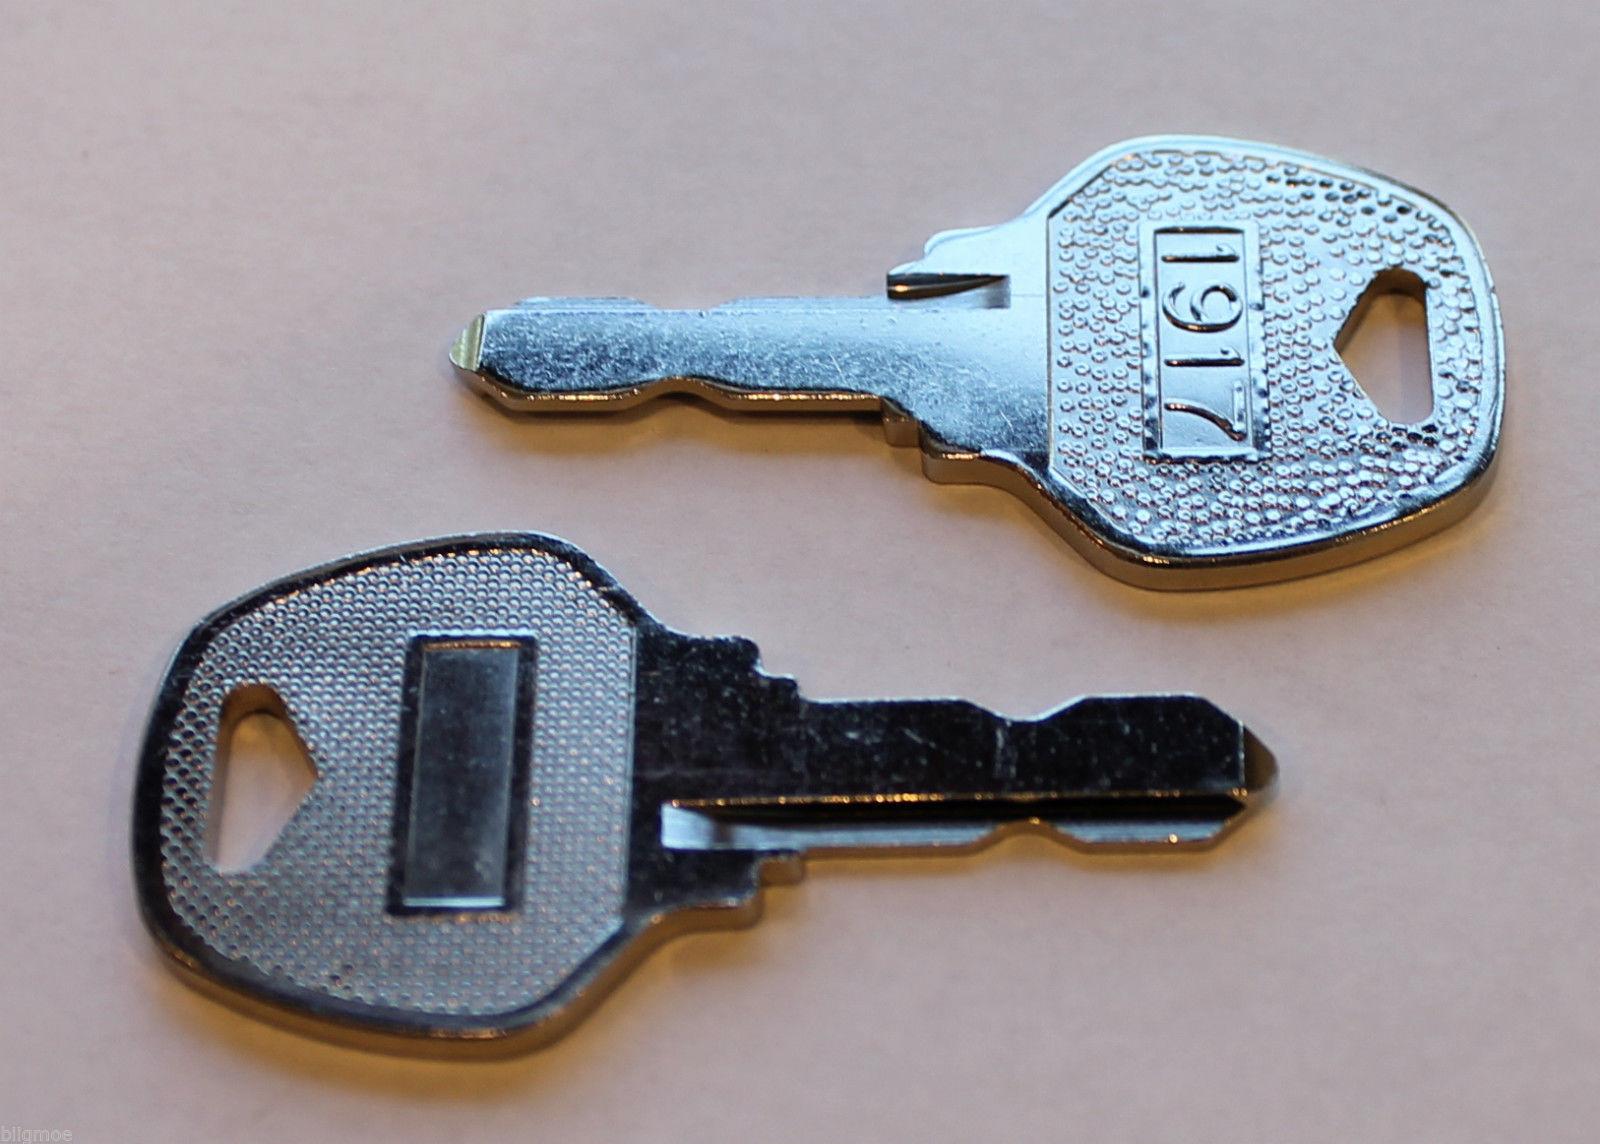 harley davidson ignition key number yamaha banshee wiring harness diagram columbia 1989 95 replacement keys golf